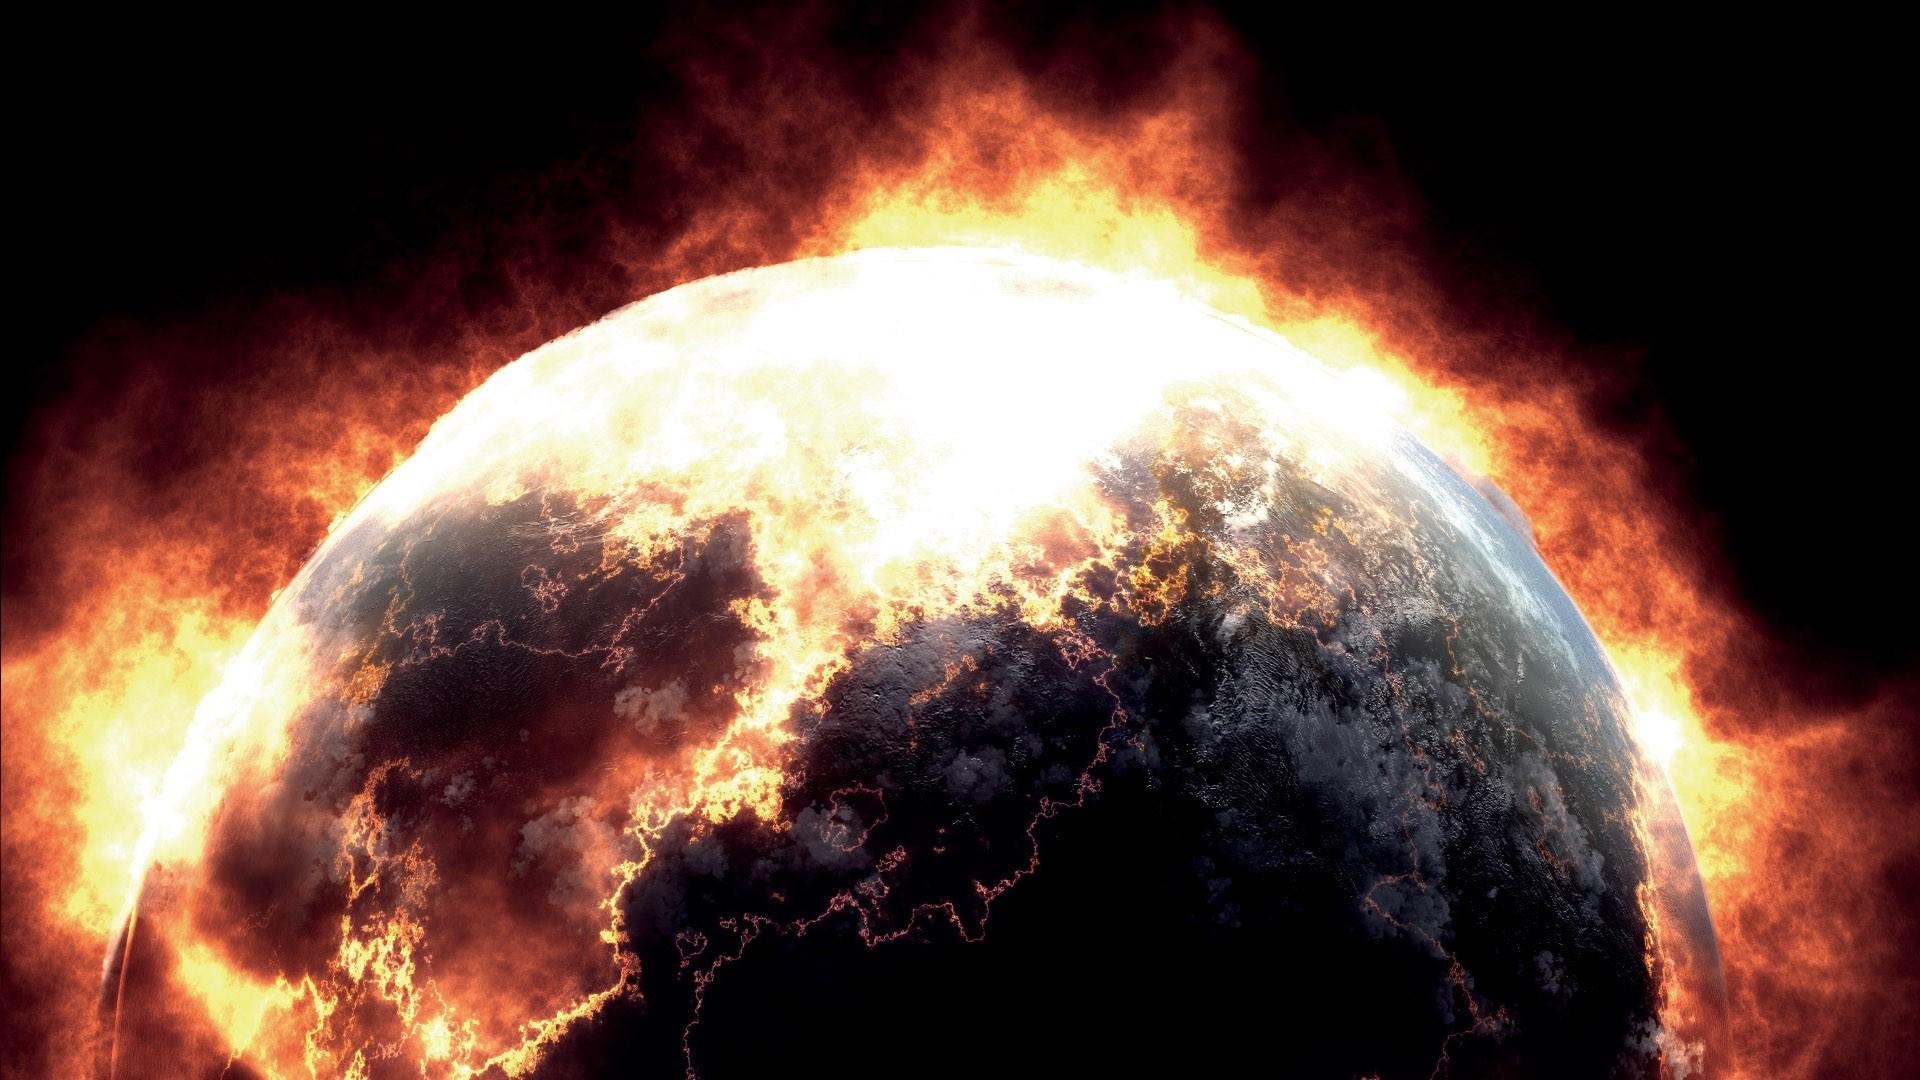 Subraumwelle der Hobus Supernova zerstört Romulus